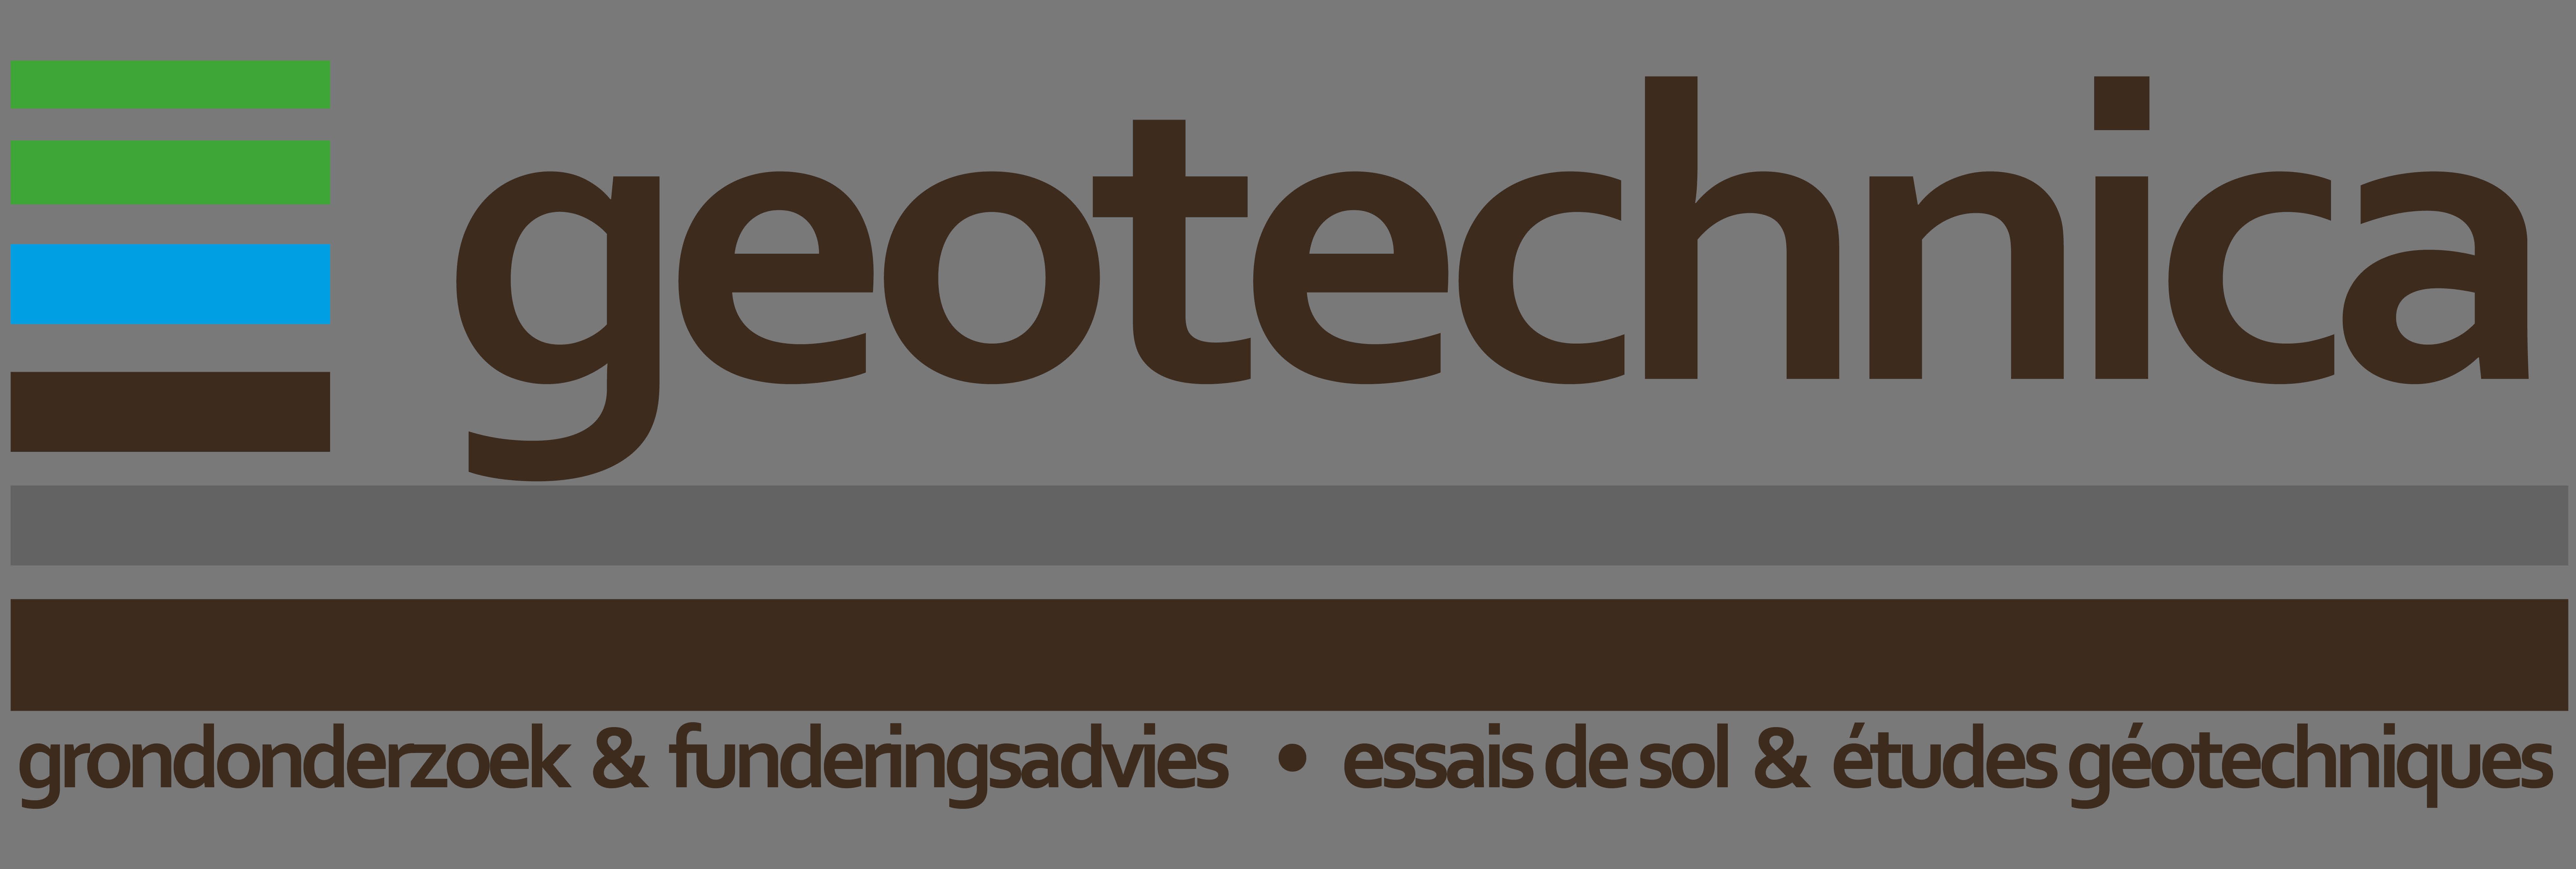 Geotechnica Logo